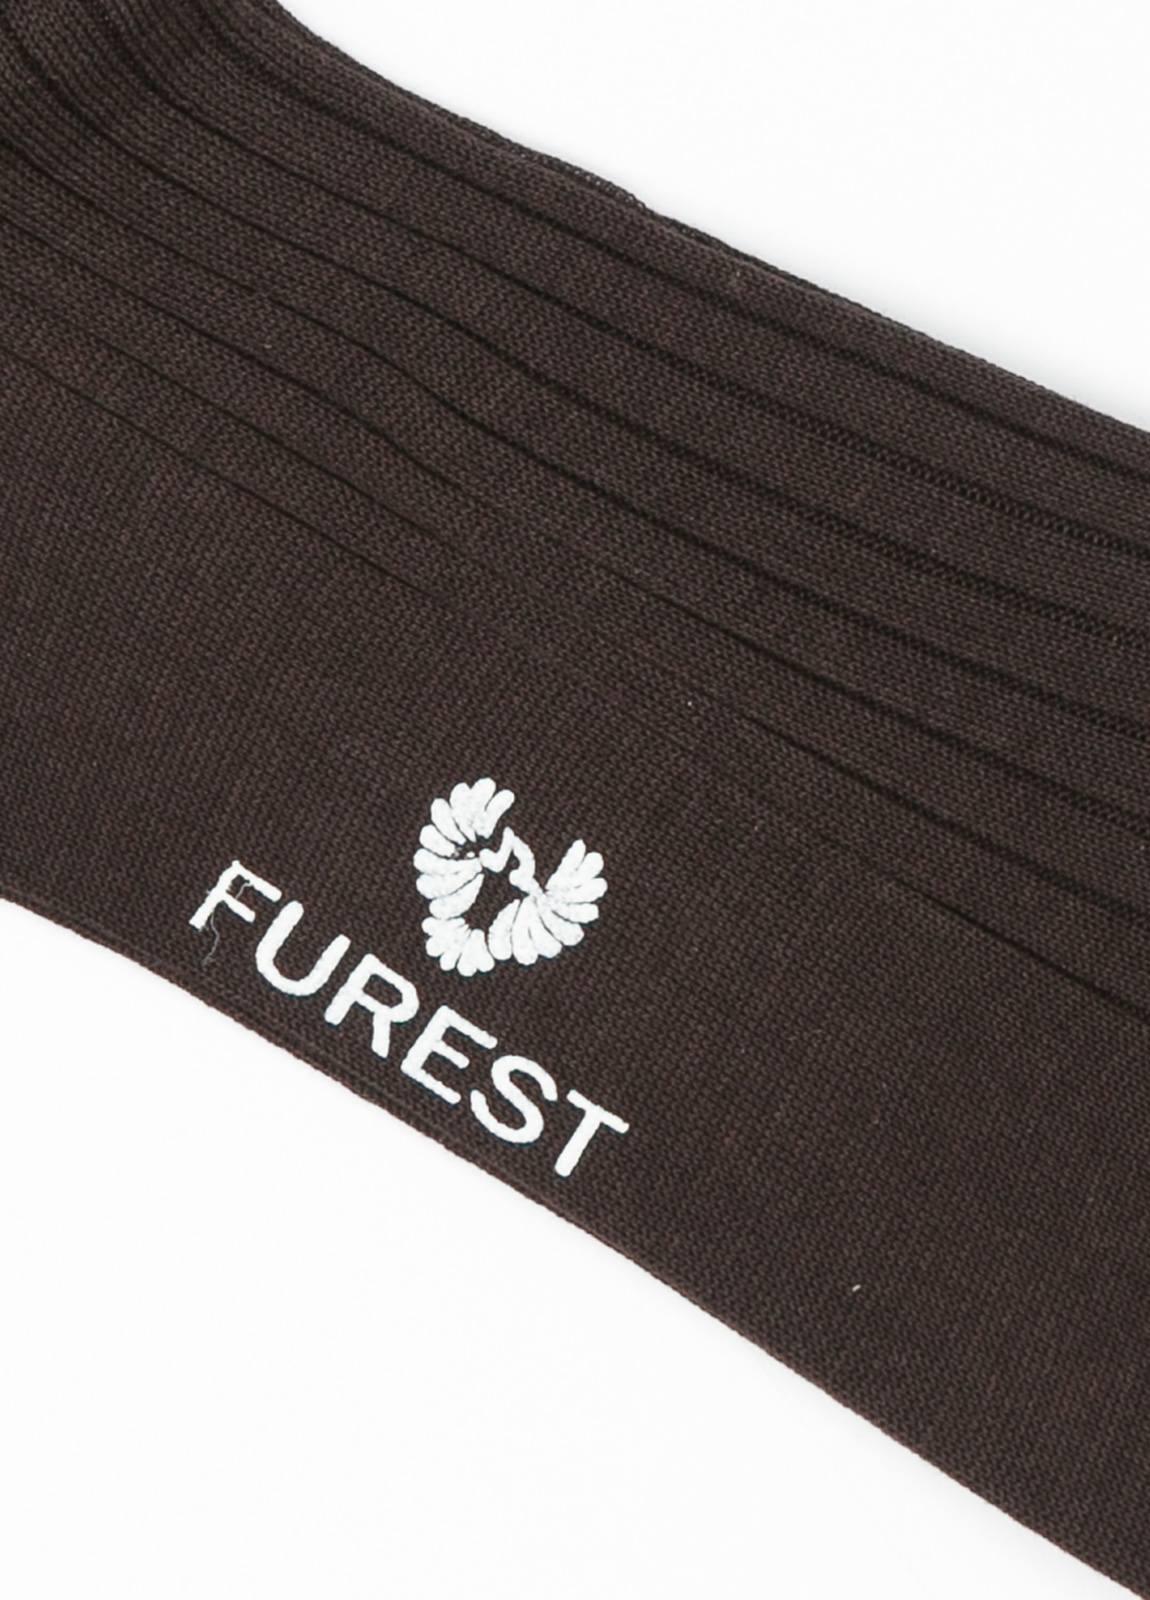 furest colección,calcetín corto de canalé marrón 100% hilo de escocia,12v39001330 - Ítem1